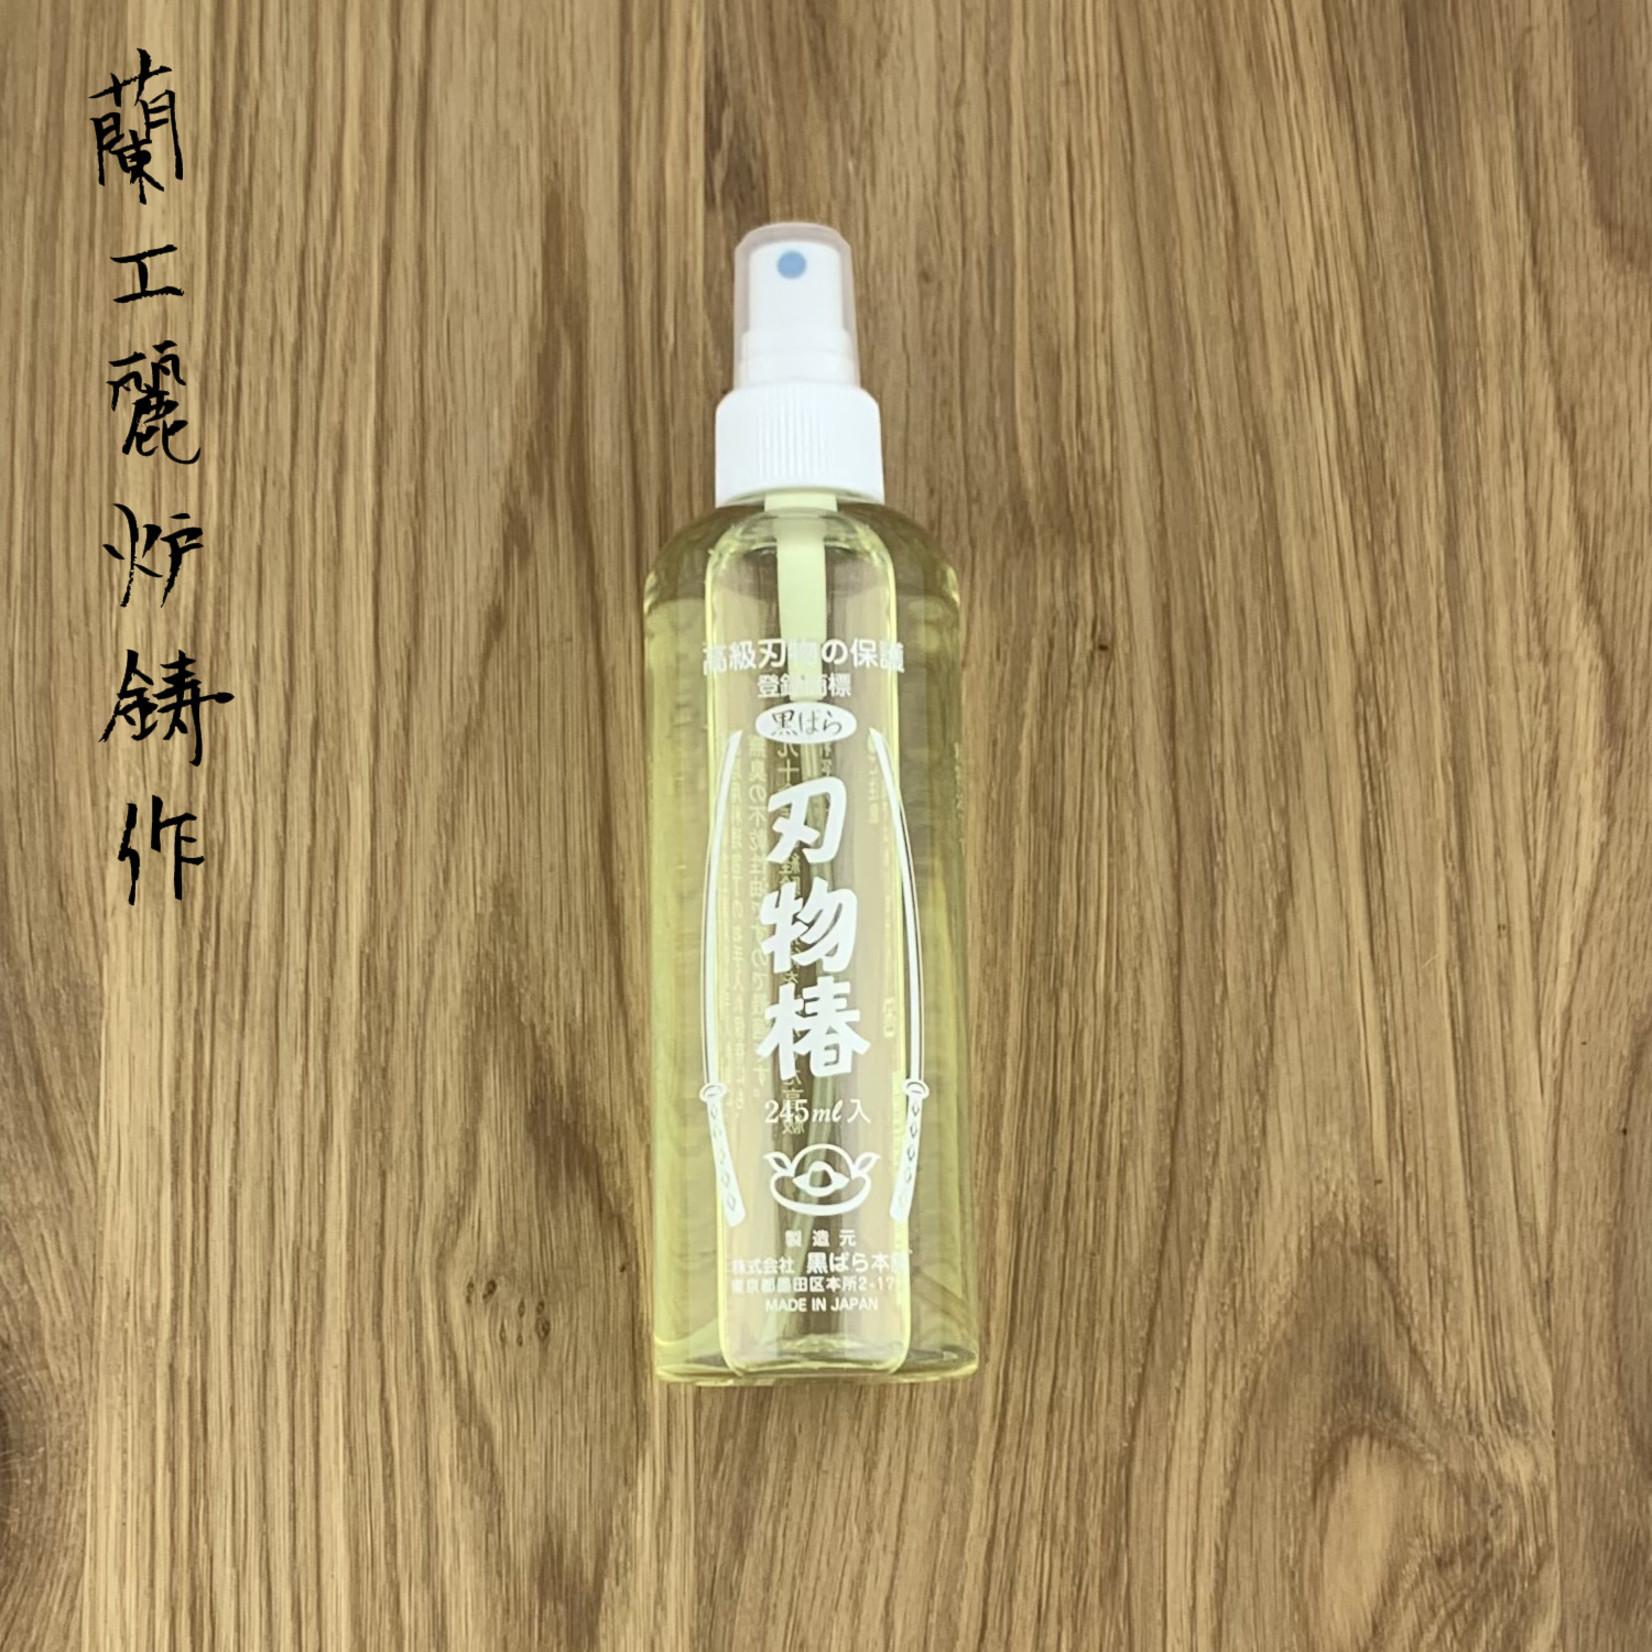 SAKAI TAKAYUKI Tsubaki Oil 9384